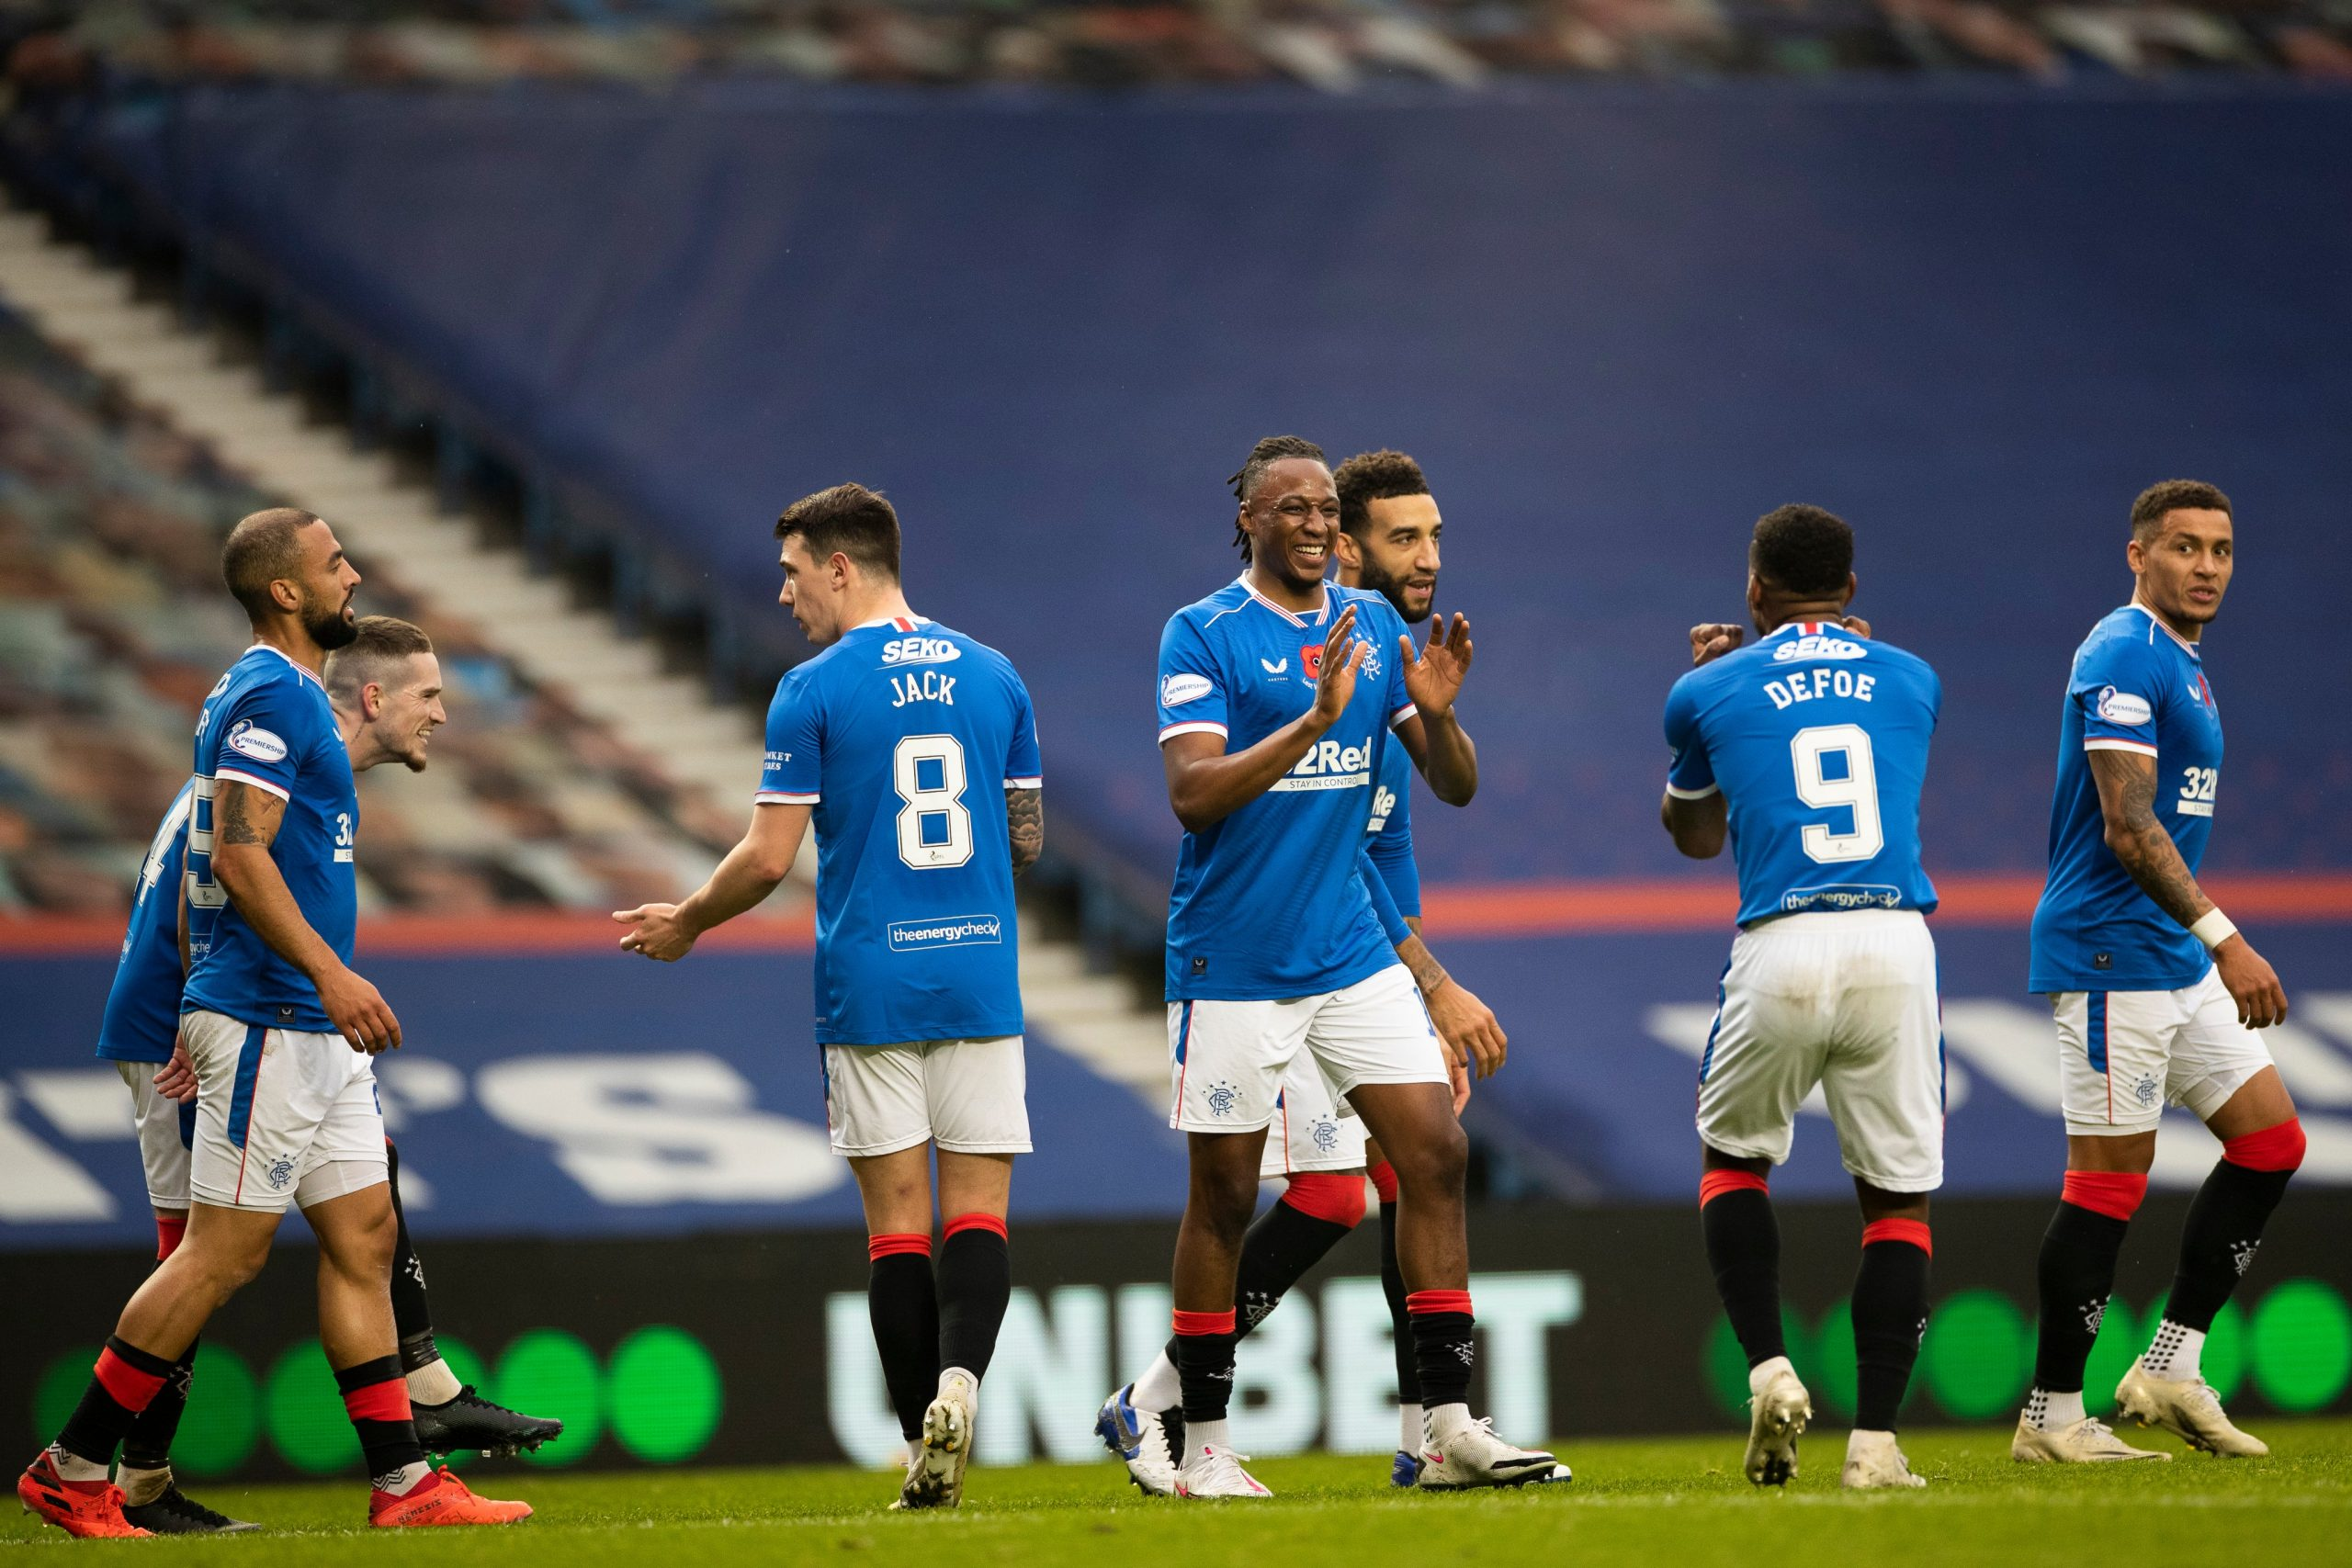 Scotland: Aribo Bags Brace As Rangers Thrash Hamilton Academical To Show Title Credentials